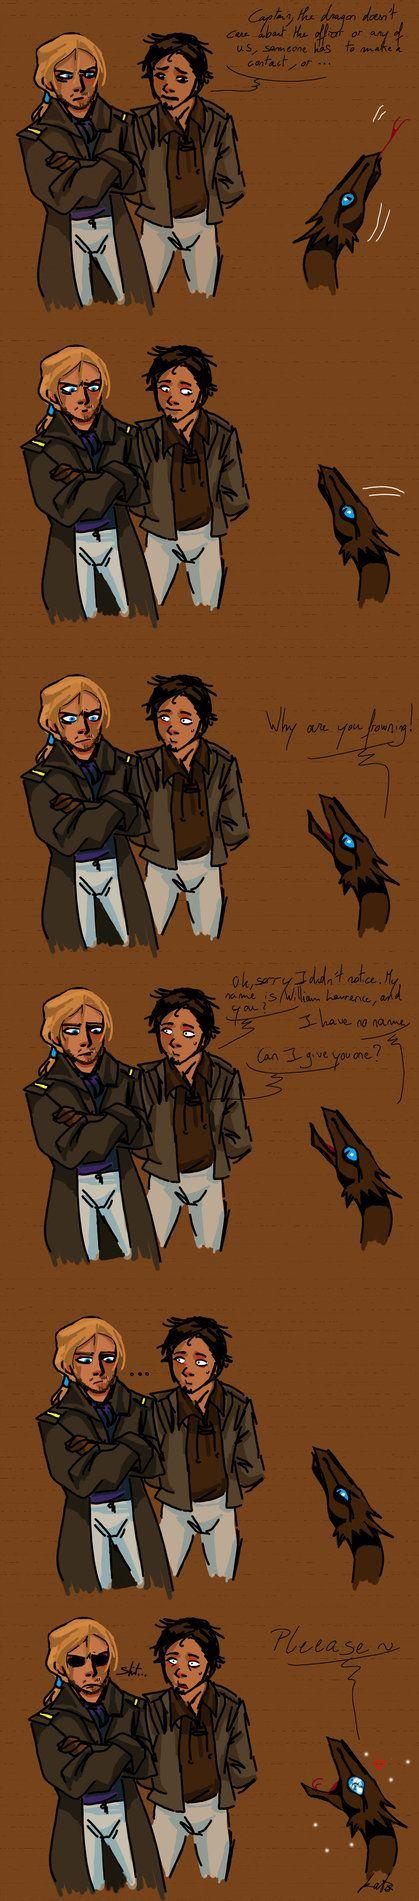 When Captain Wurence Meet Temeraire 30 By Kurokato